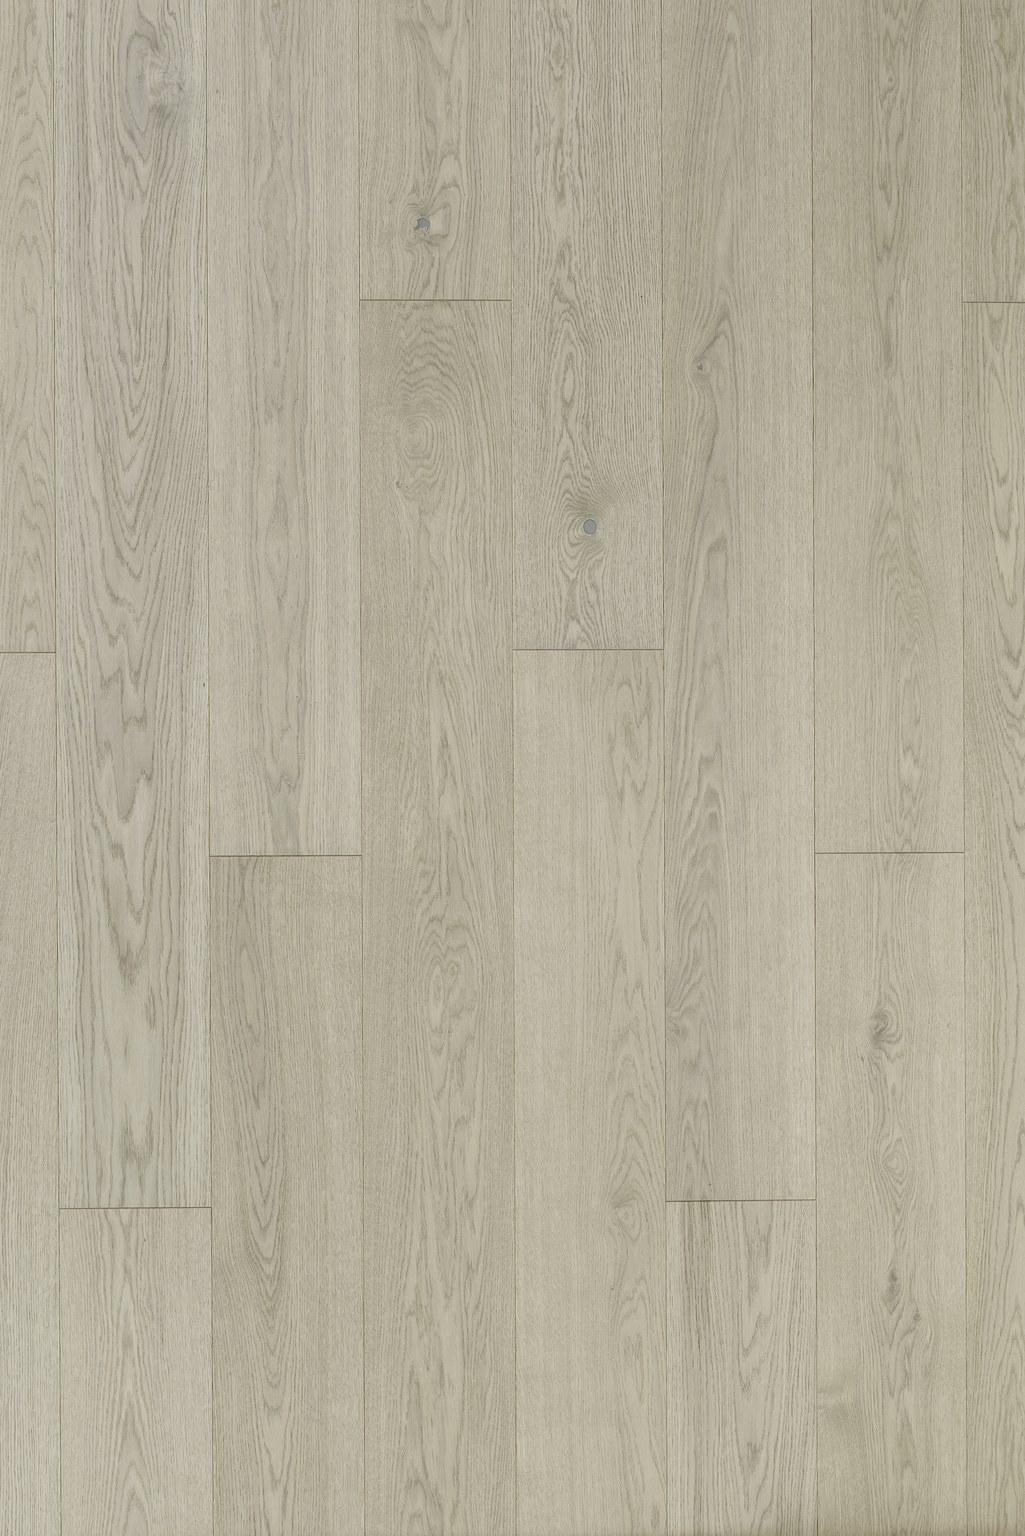 Timberwise Parketti Lankkuparketti Puulattia Wooden Floor Parquet Plank Tammi Oak Grey 2D1